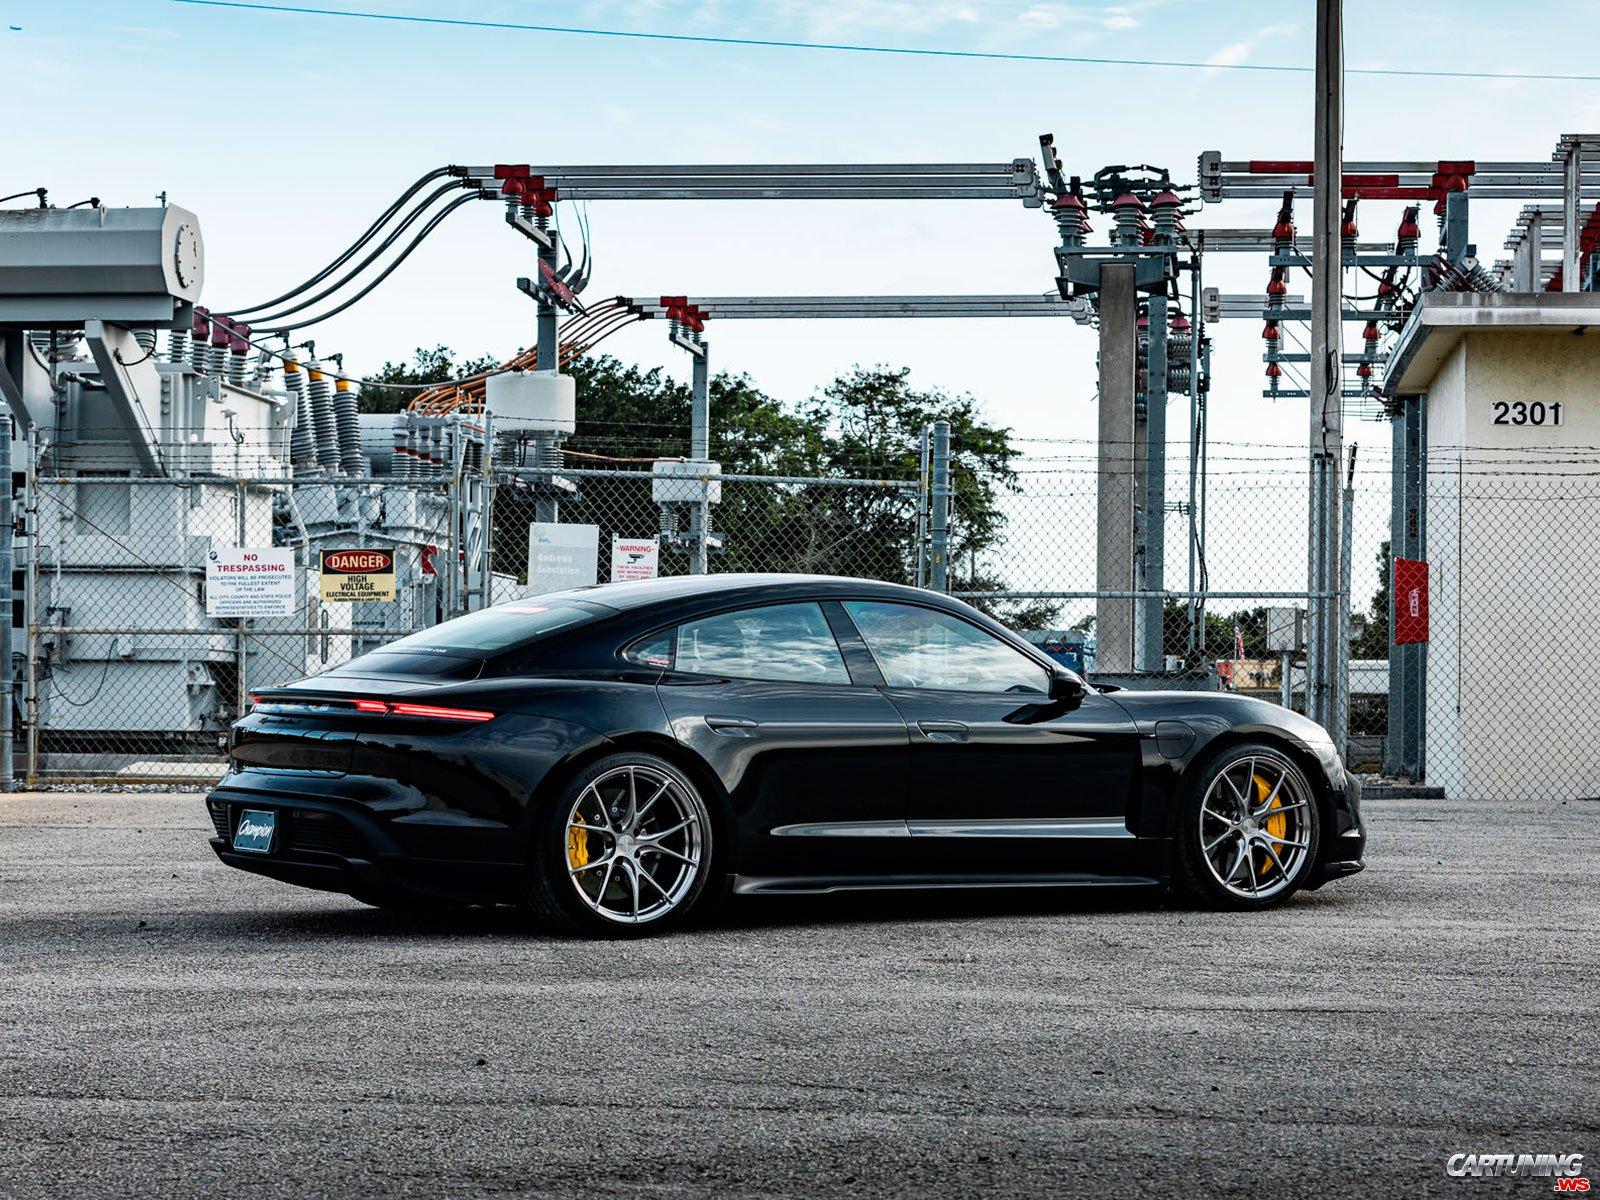 Tuning Porsche Taycan Back